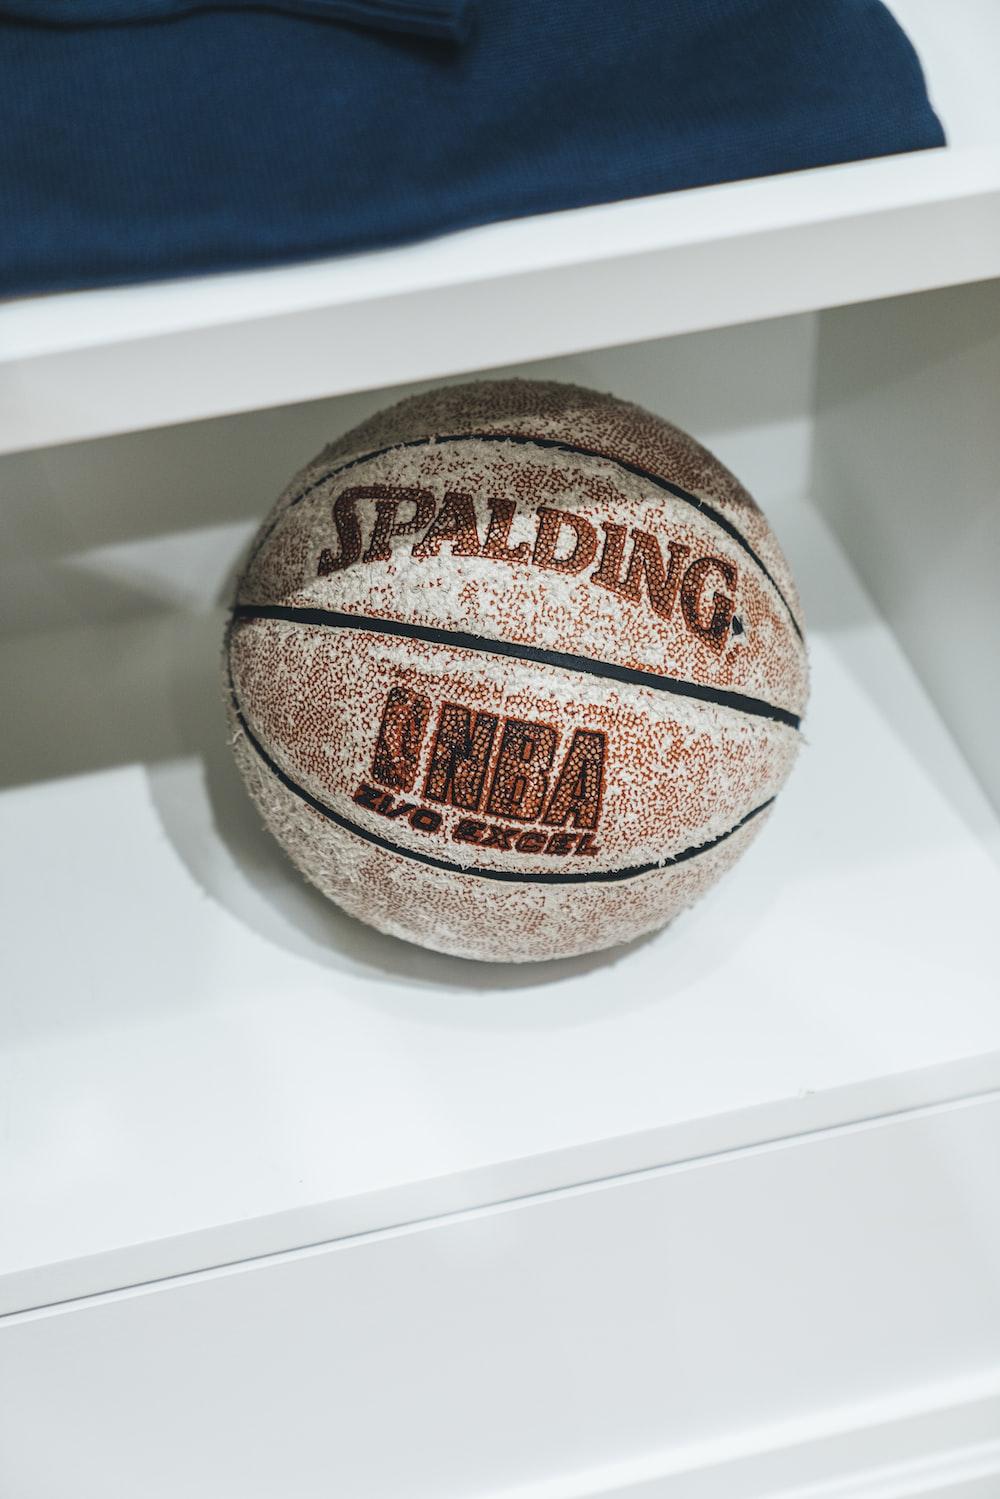 Spalding basketball in shelf